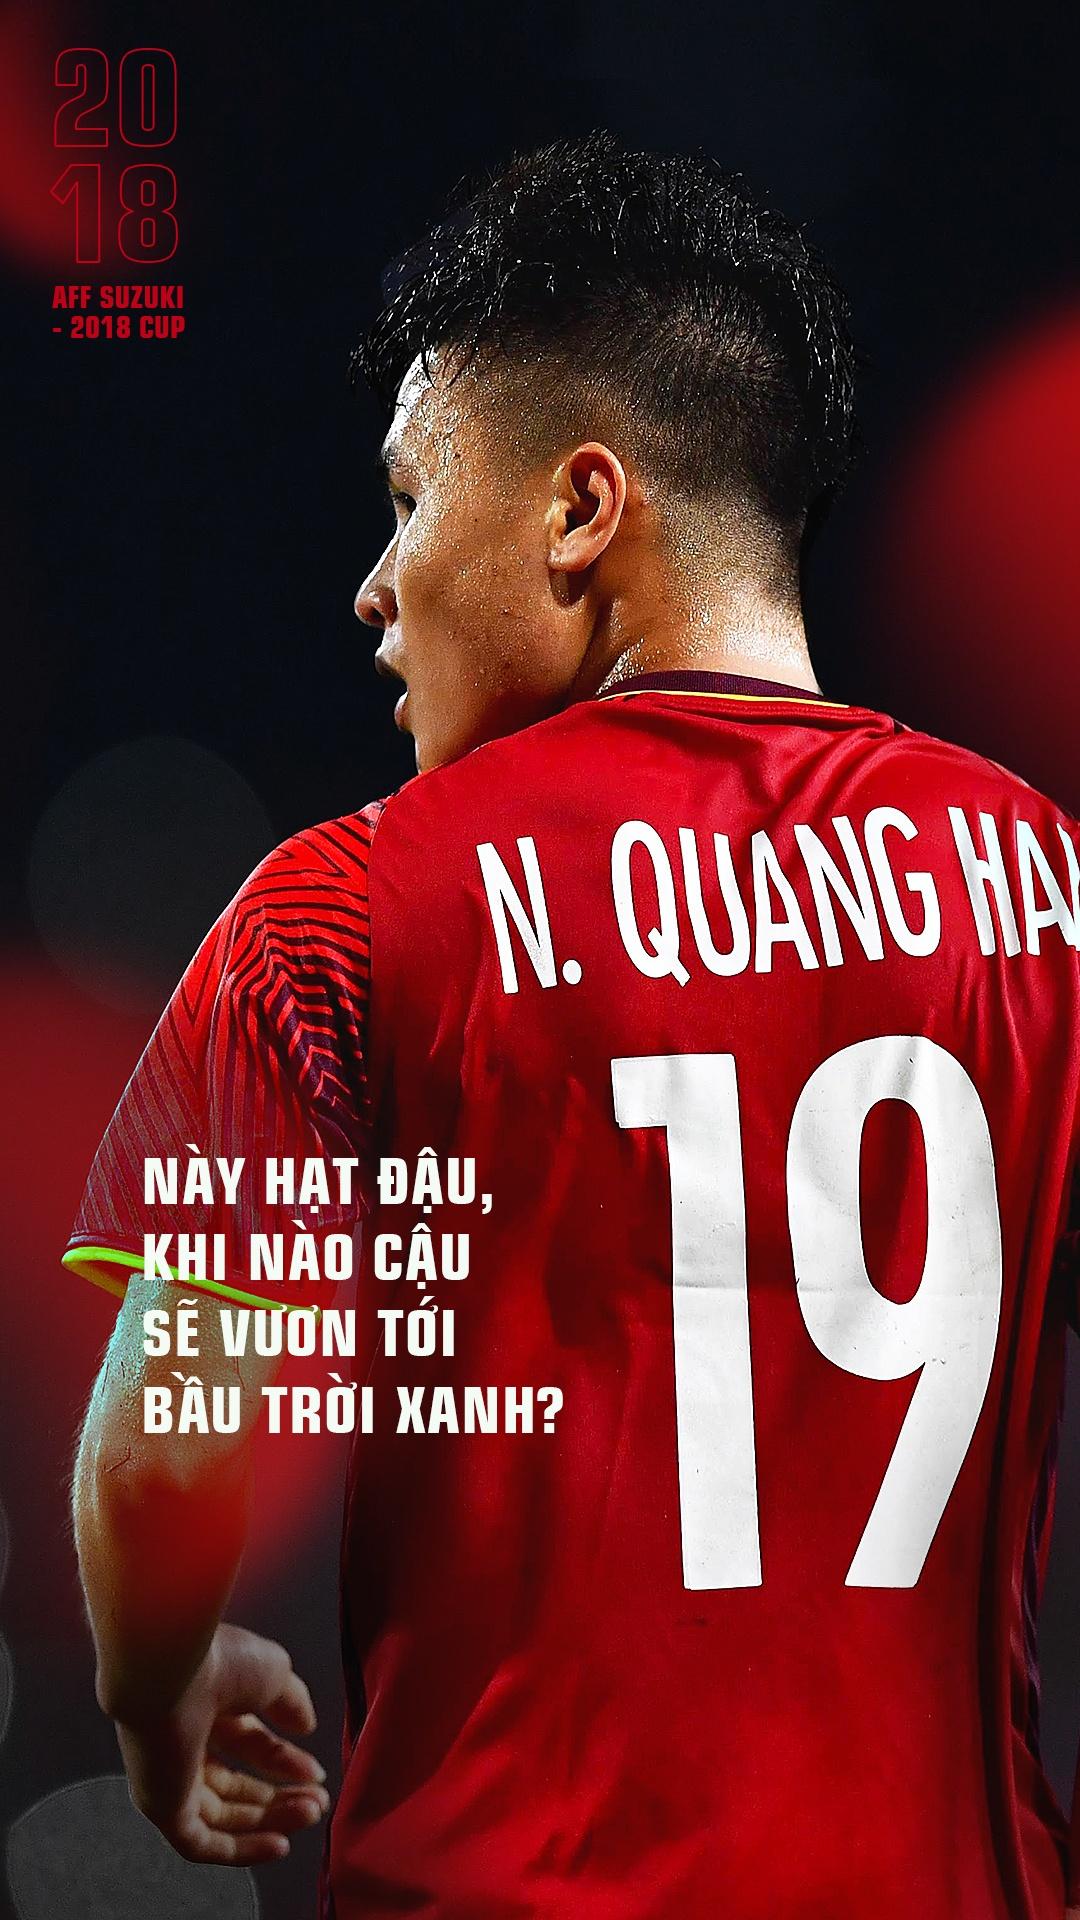 Quang Hai - nay hat dau, khi nao cau se vuon toi bau troi xanh? hinh anh 1